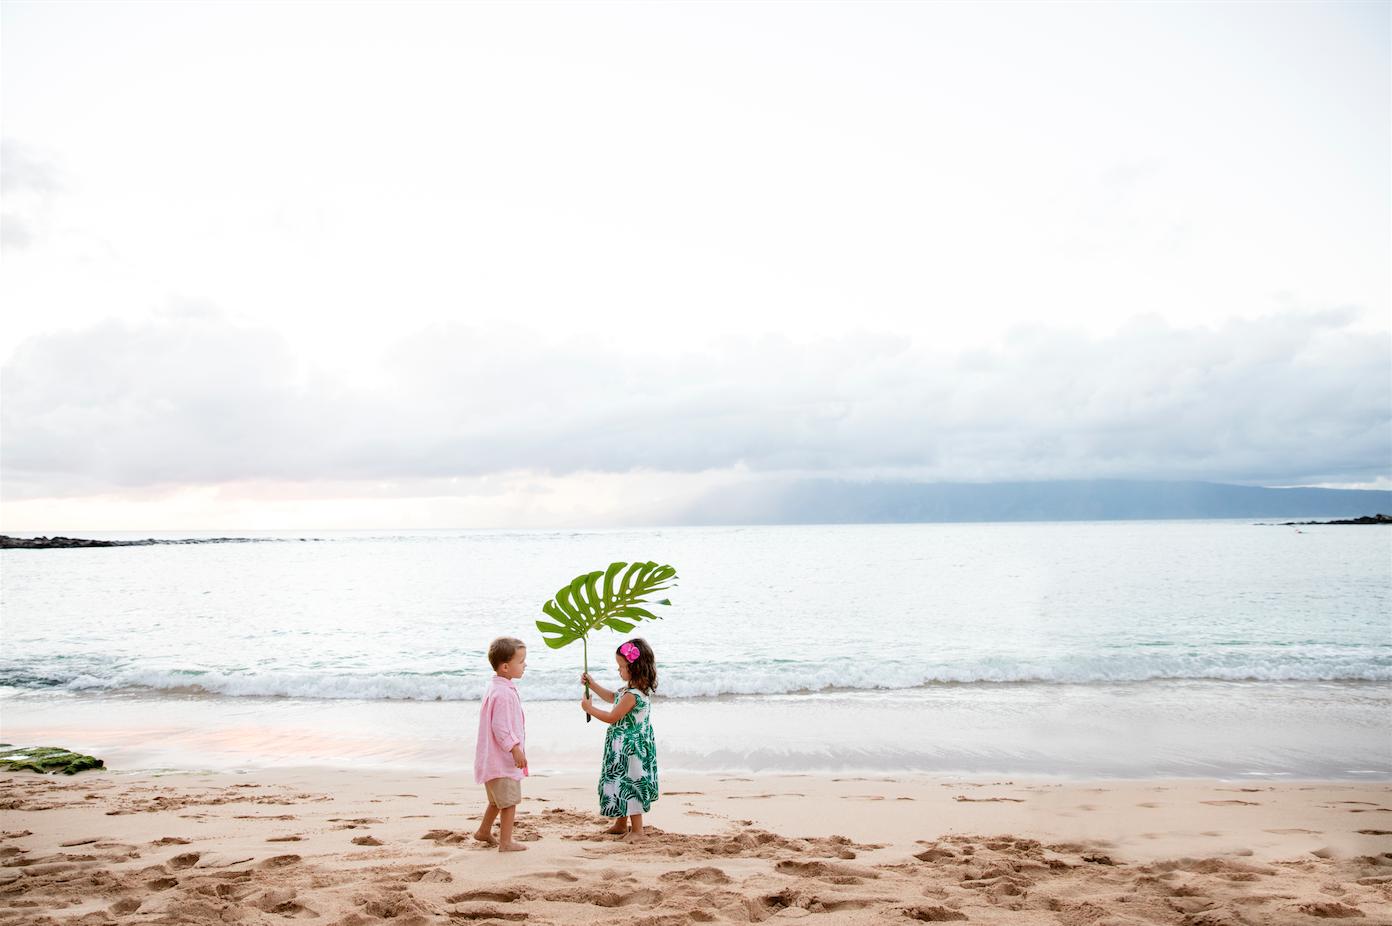 maui family vacation guide